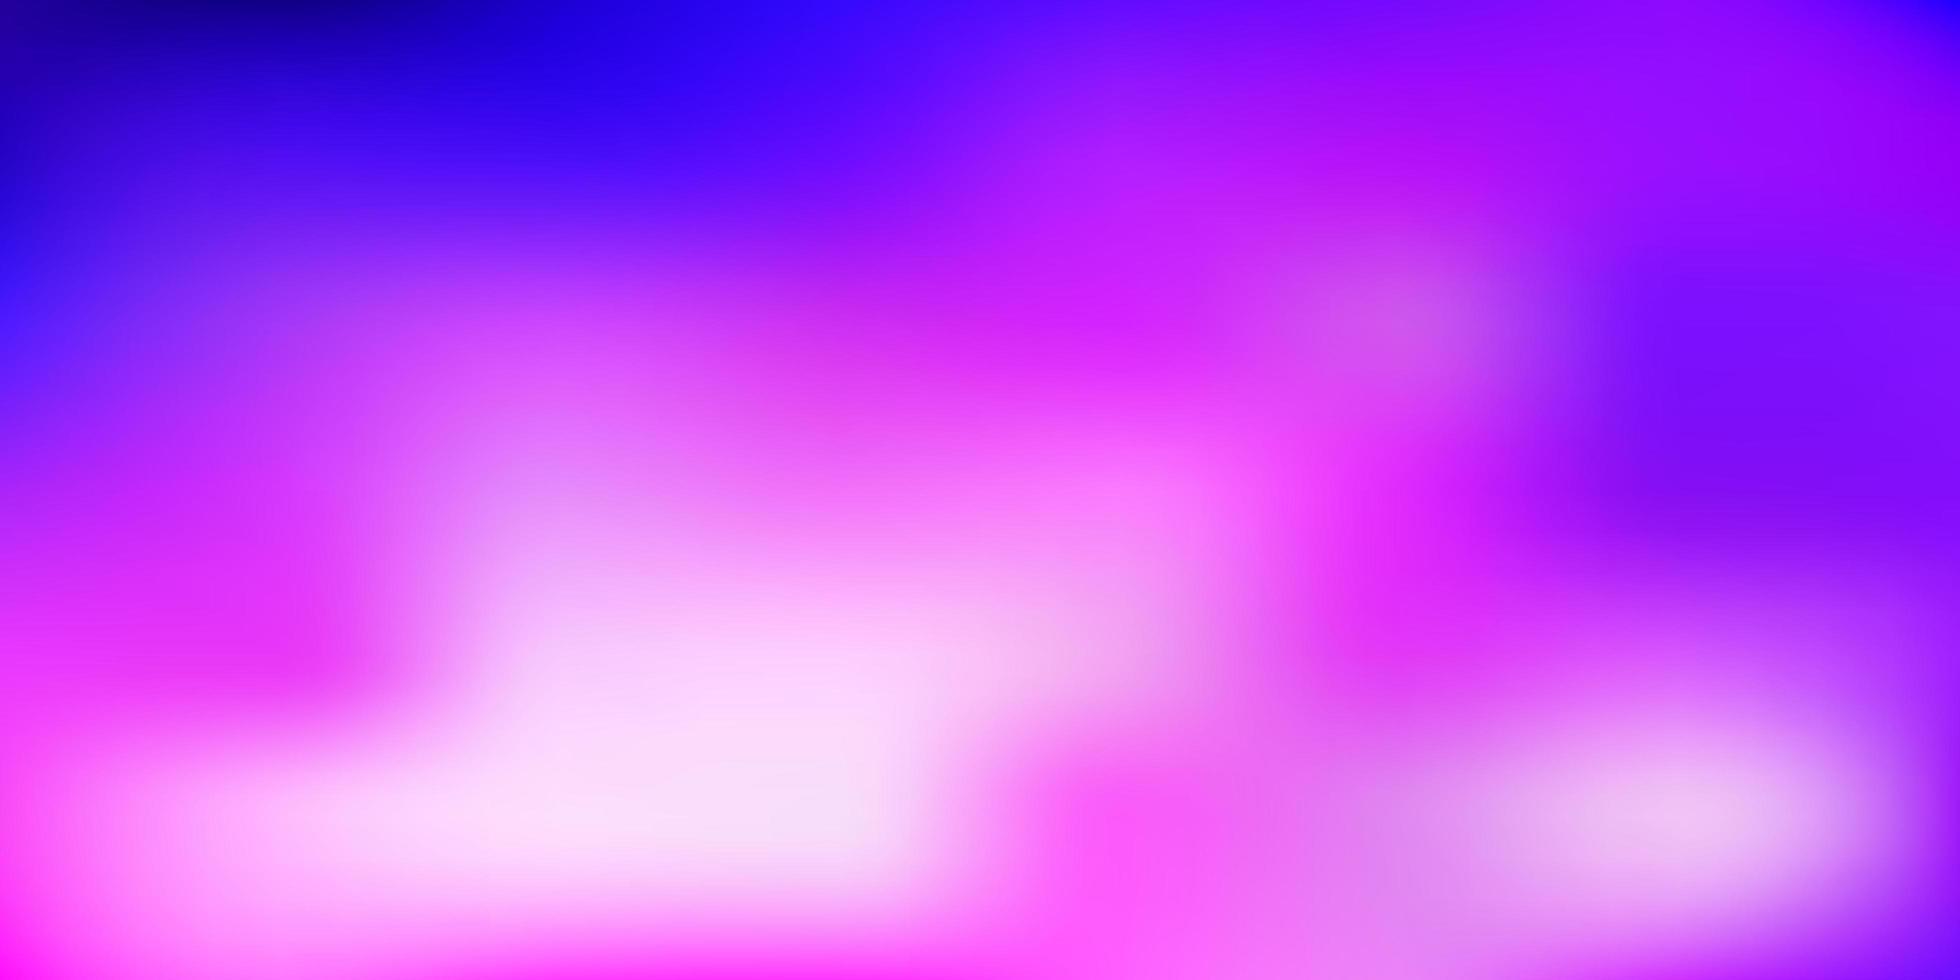 luz turva vector roxo, rosa textura.